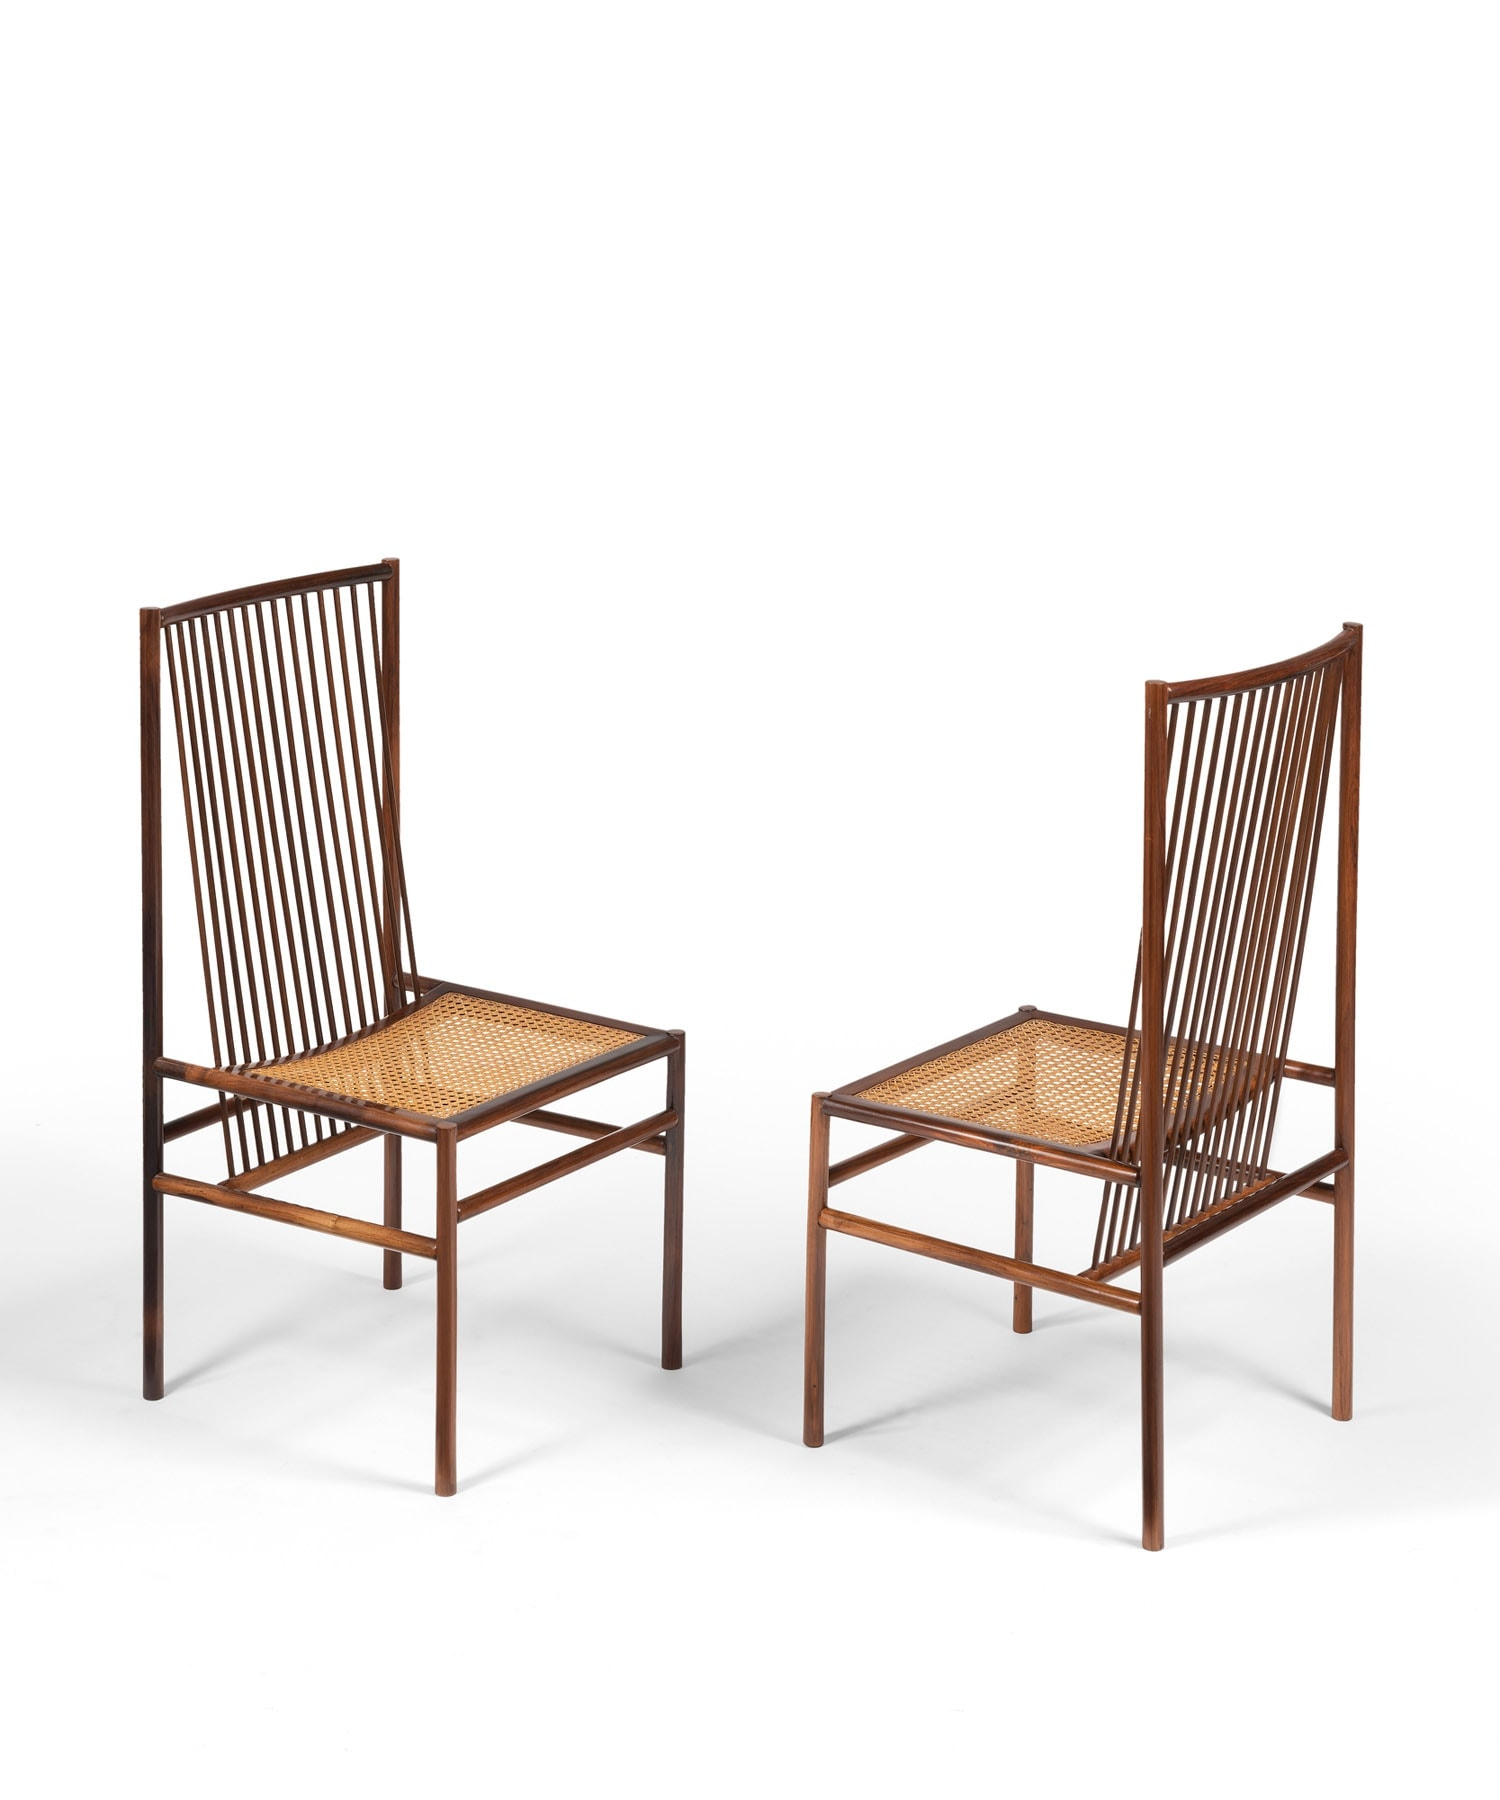 Joaquim Tenreiro, Ensemble de douze chaises «Estrutural» (vendu), vue 01